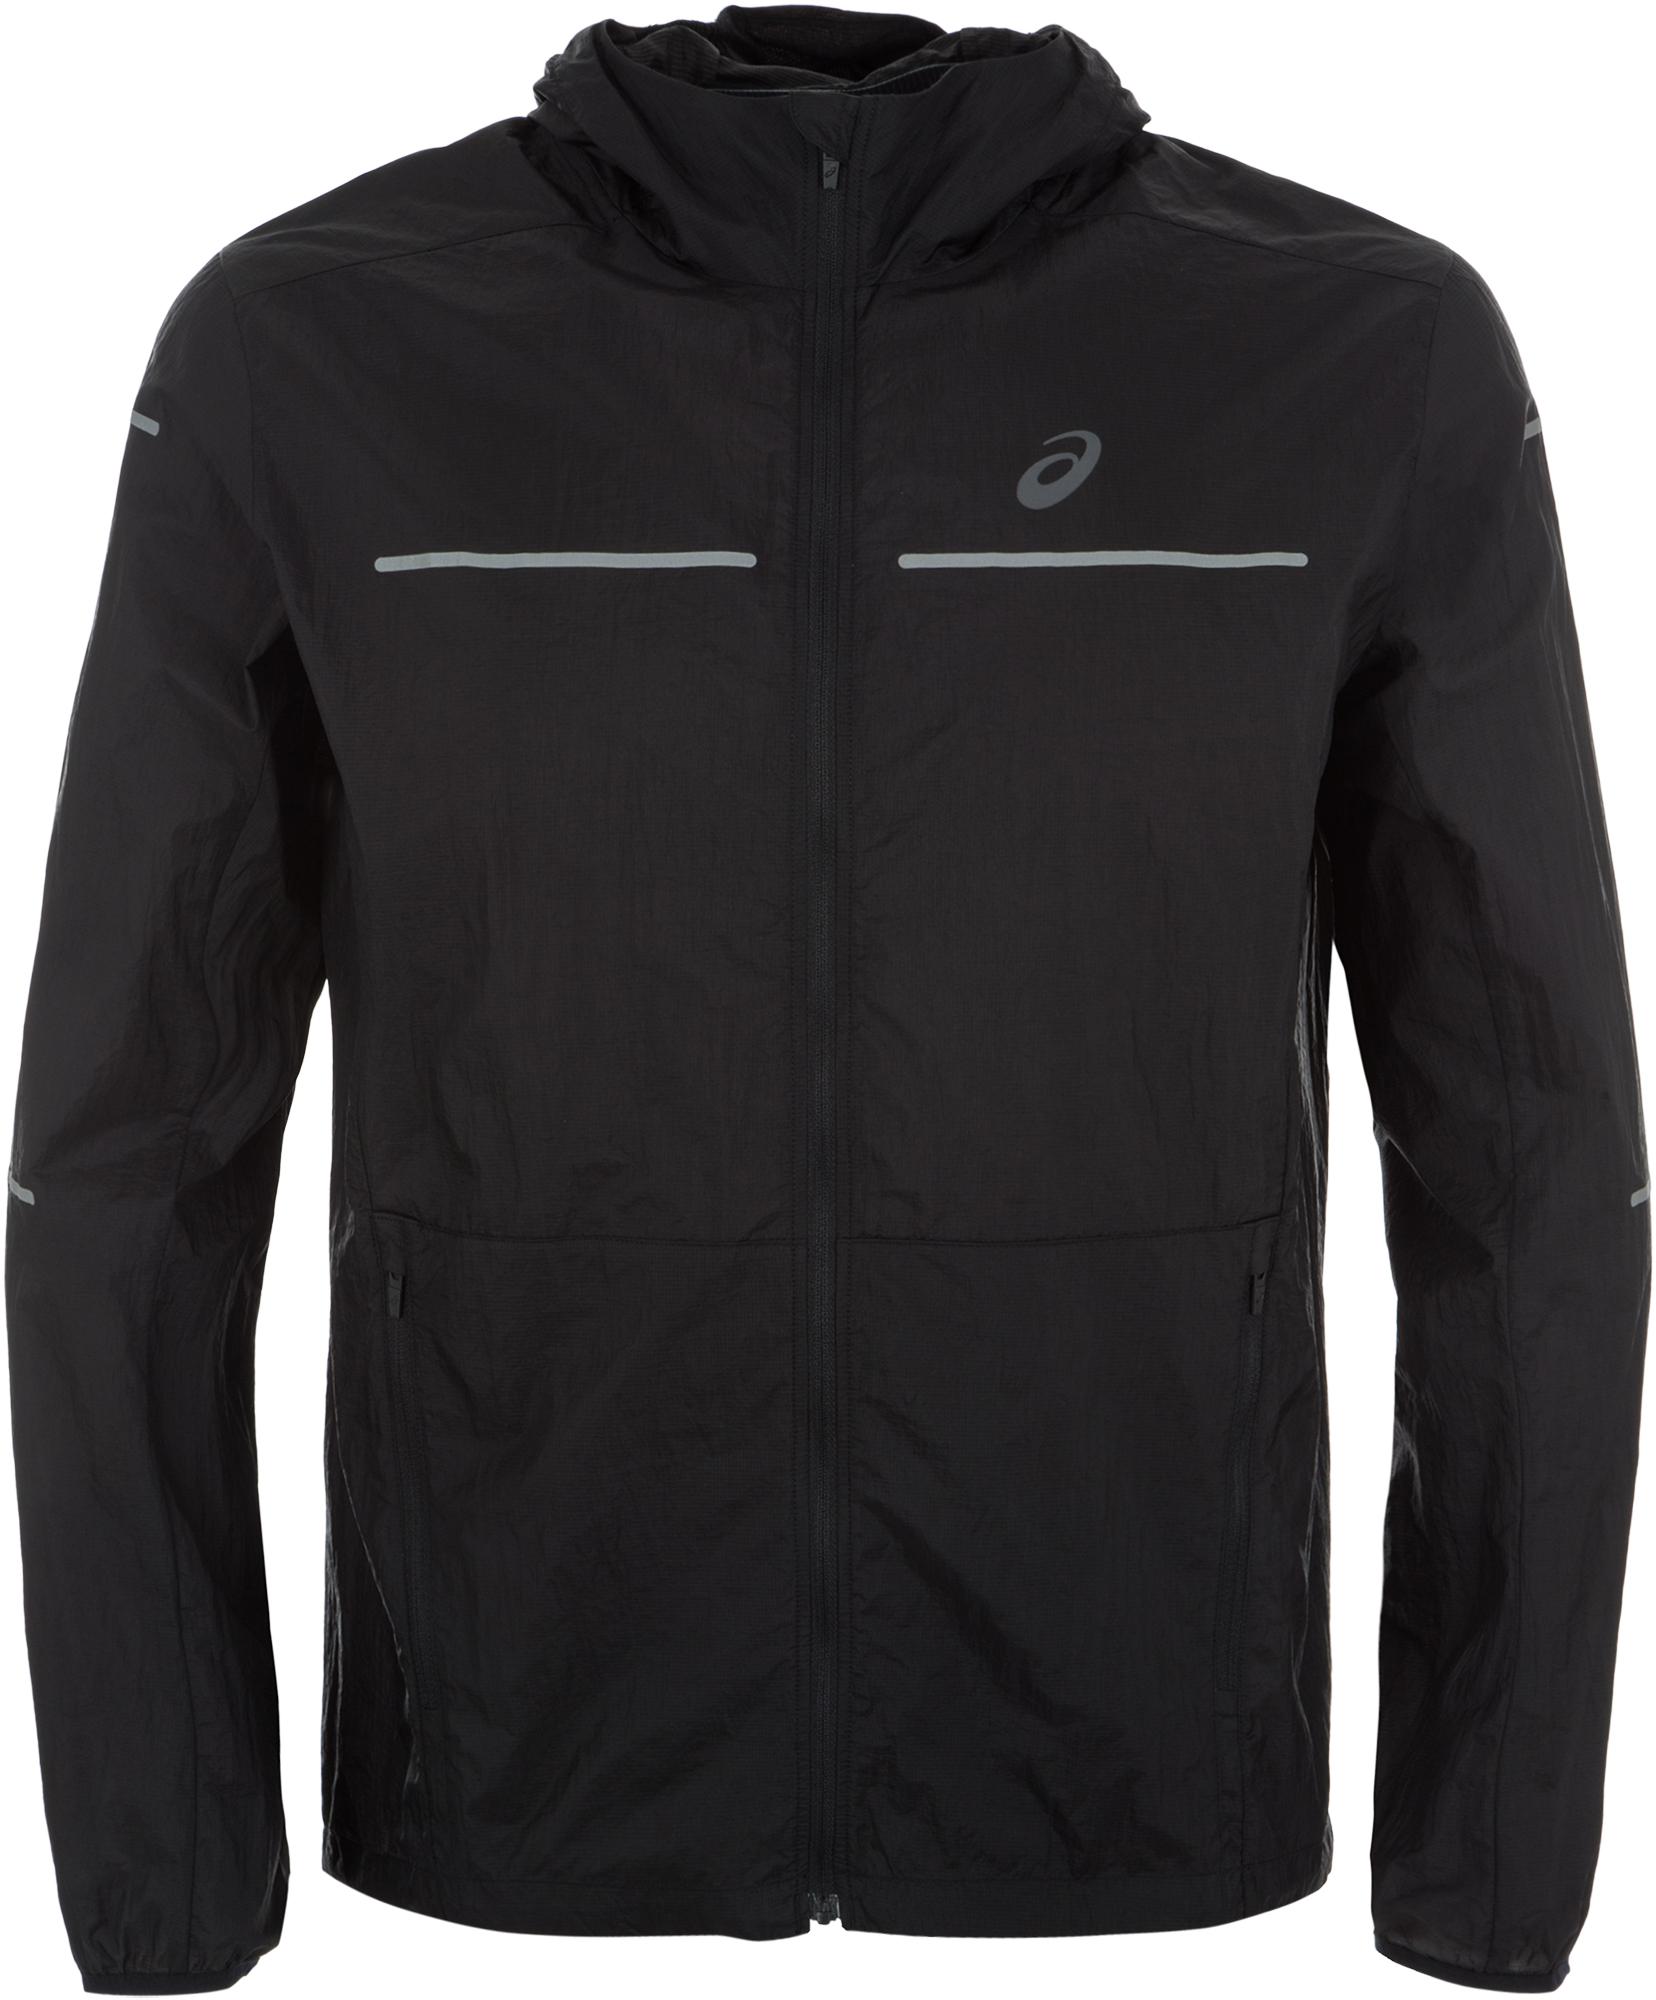 цена на ASICS Куртка мужская ASICS Lite-Show, размер 48-50